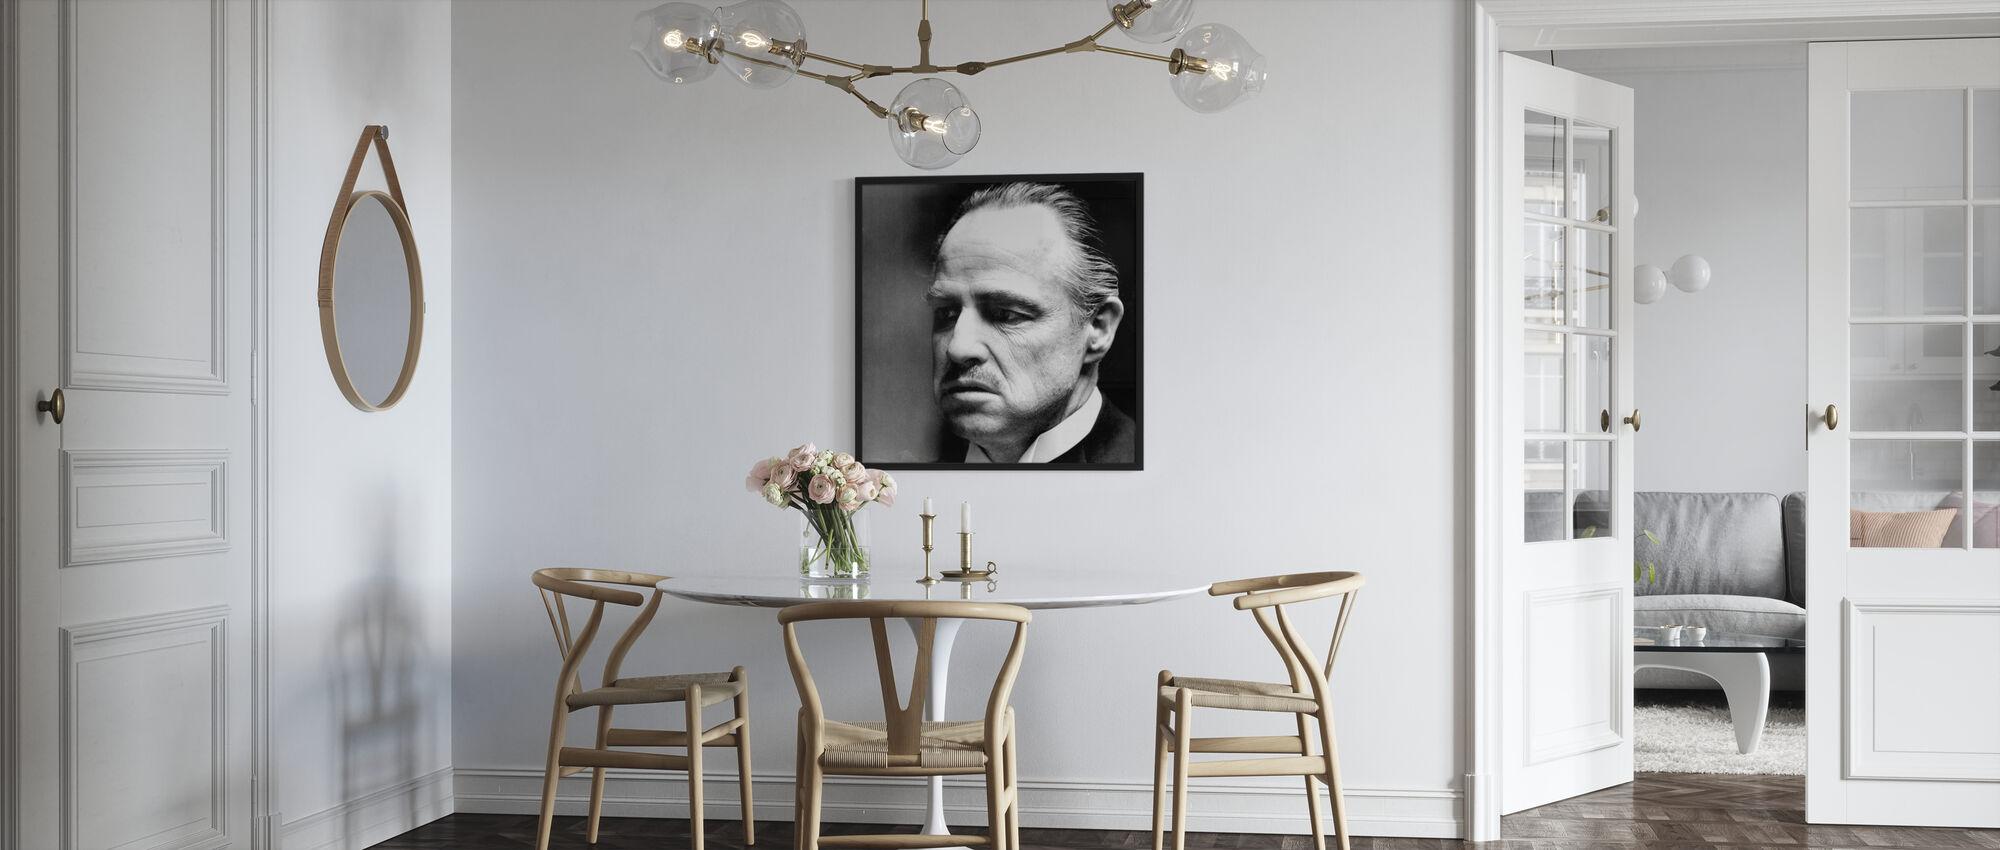 De peetvader - Don Vito Corleone - Poster - Keuken